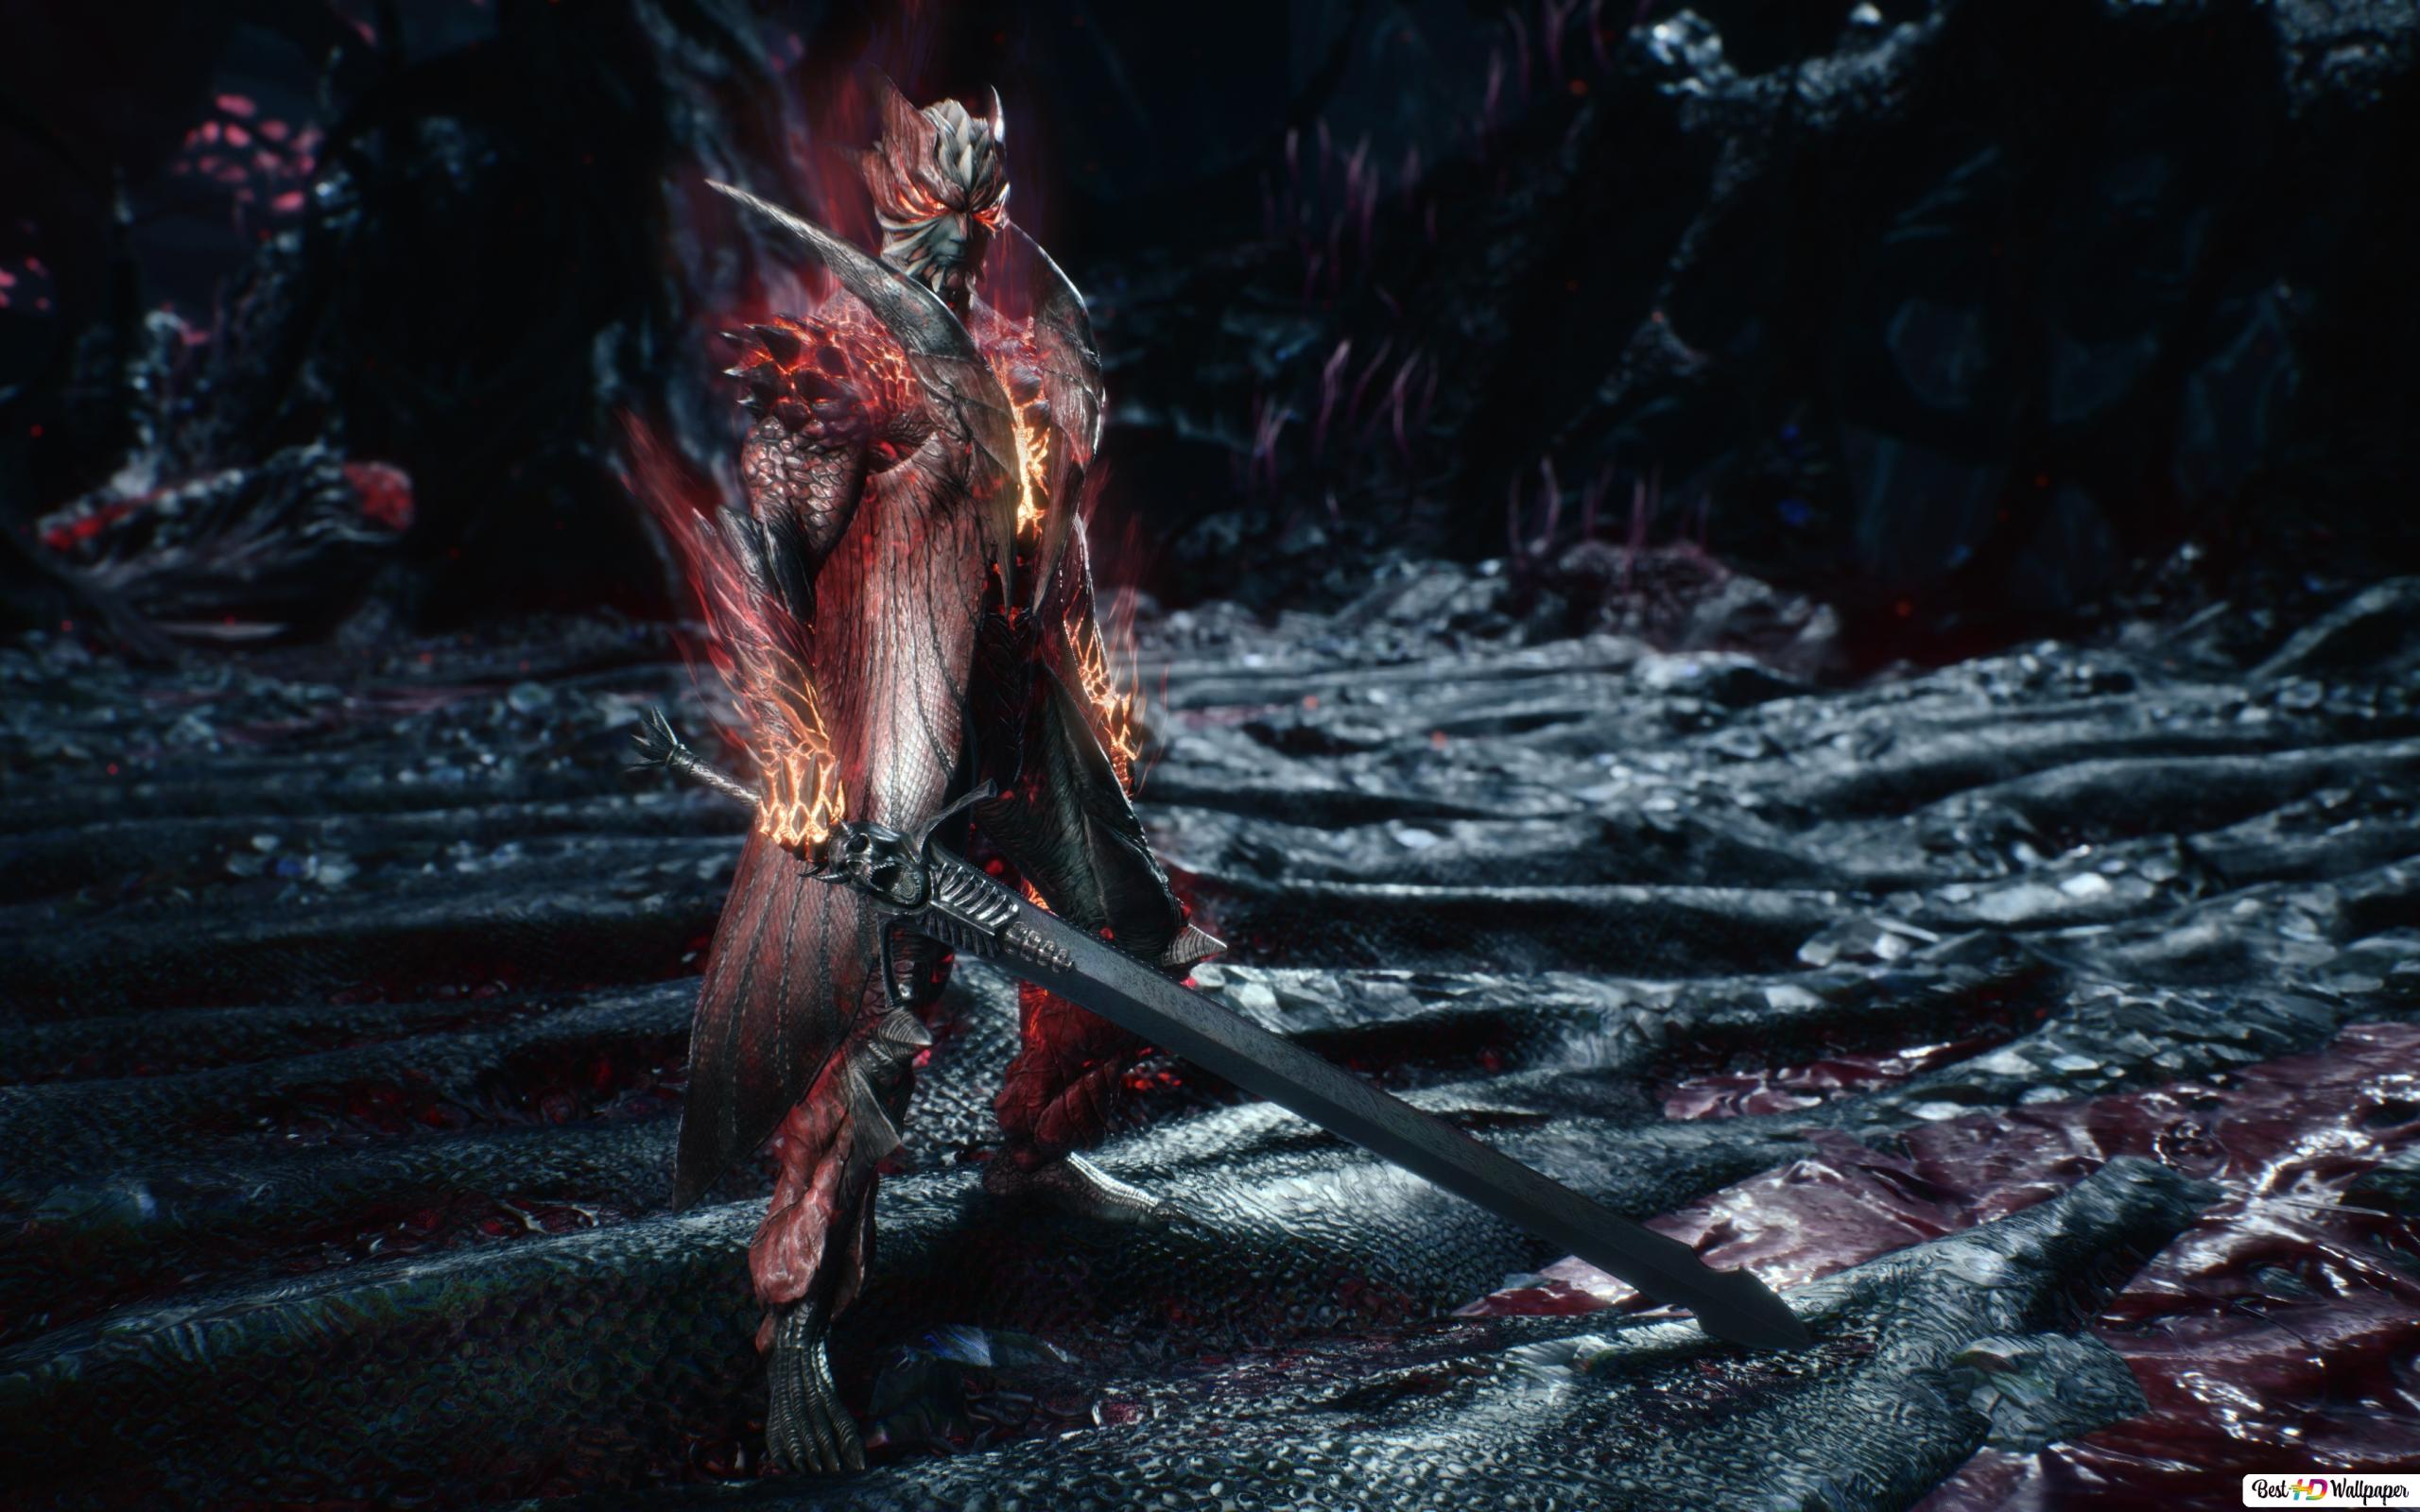 Devil May Cry 5 Dante Devil Trigger Rebellion Sword Hd Wallpaper